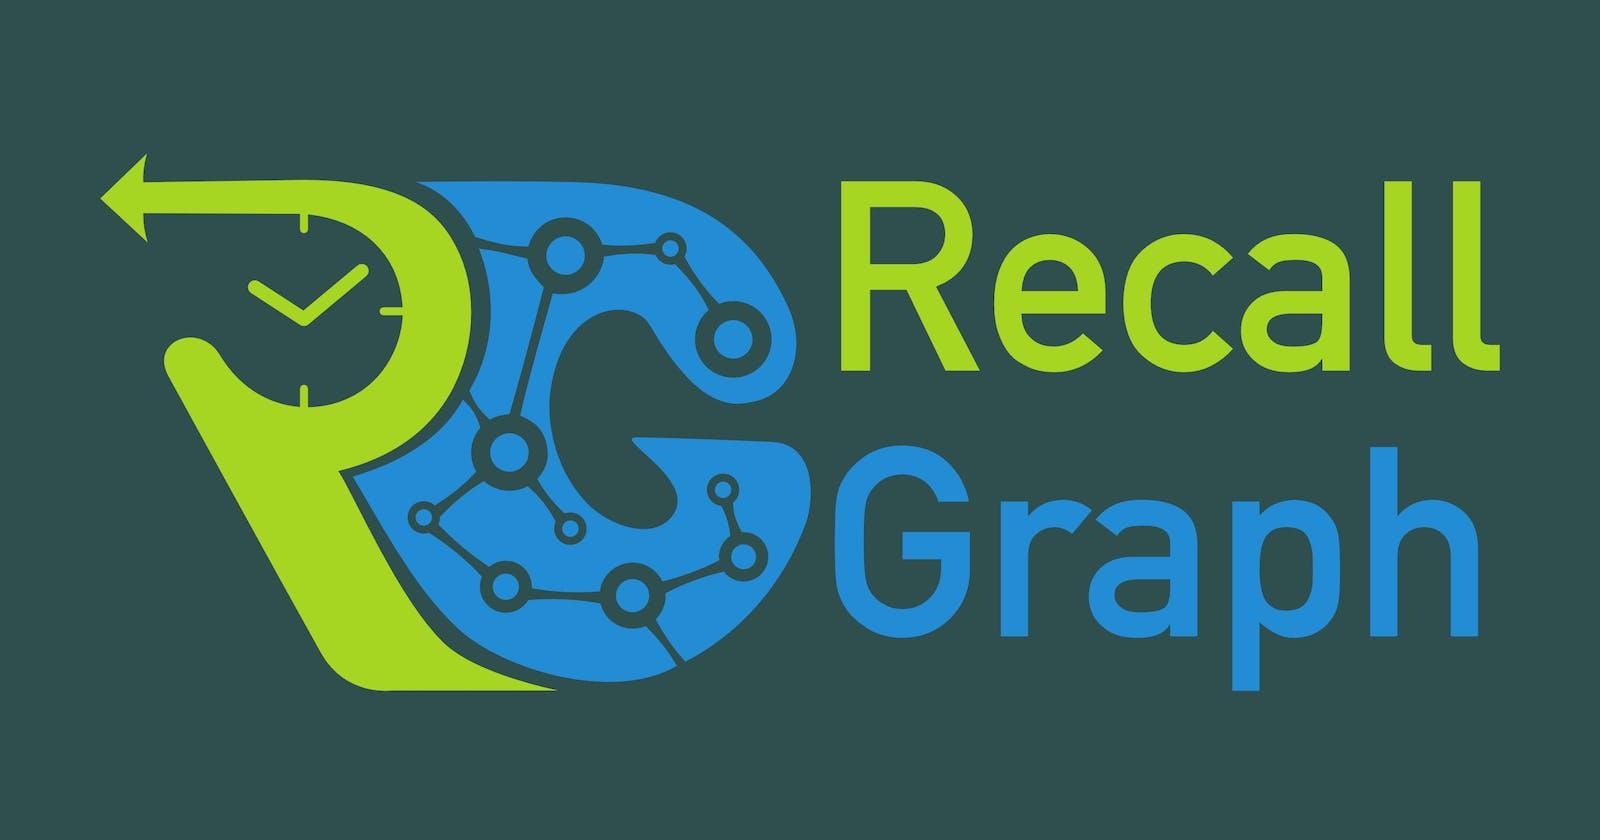 CivicGraph is now RecallGraph